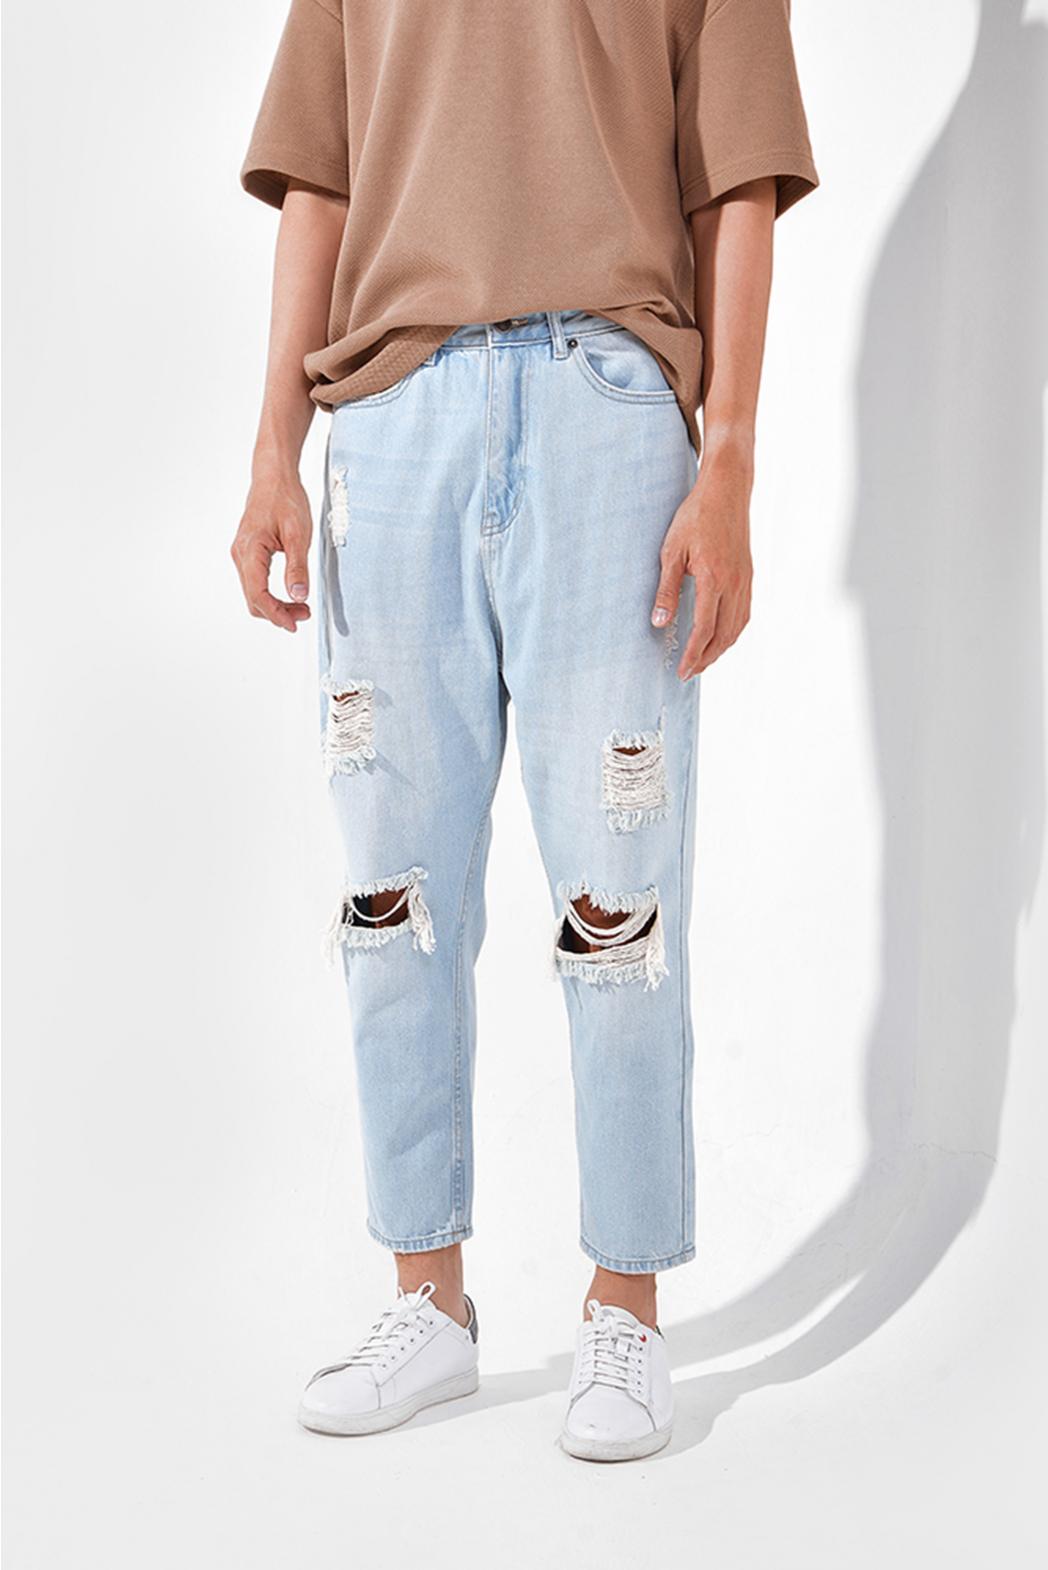 Indigo. Loose jeans rách DNP15-F19-01 - QJ228002